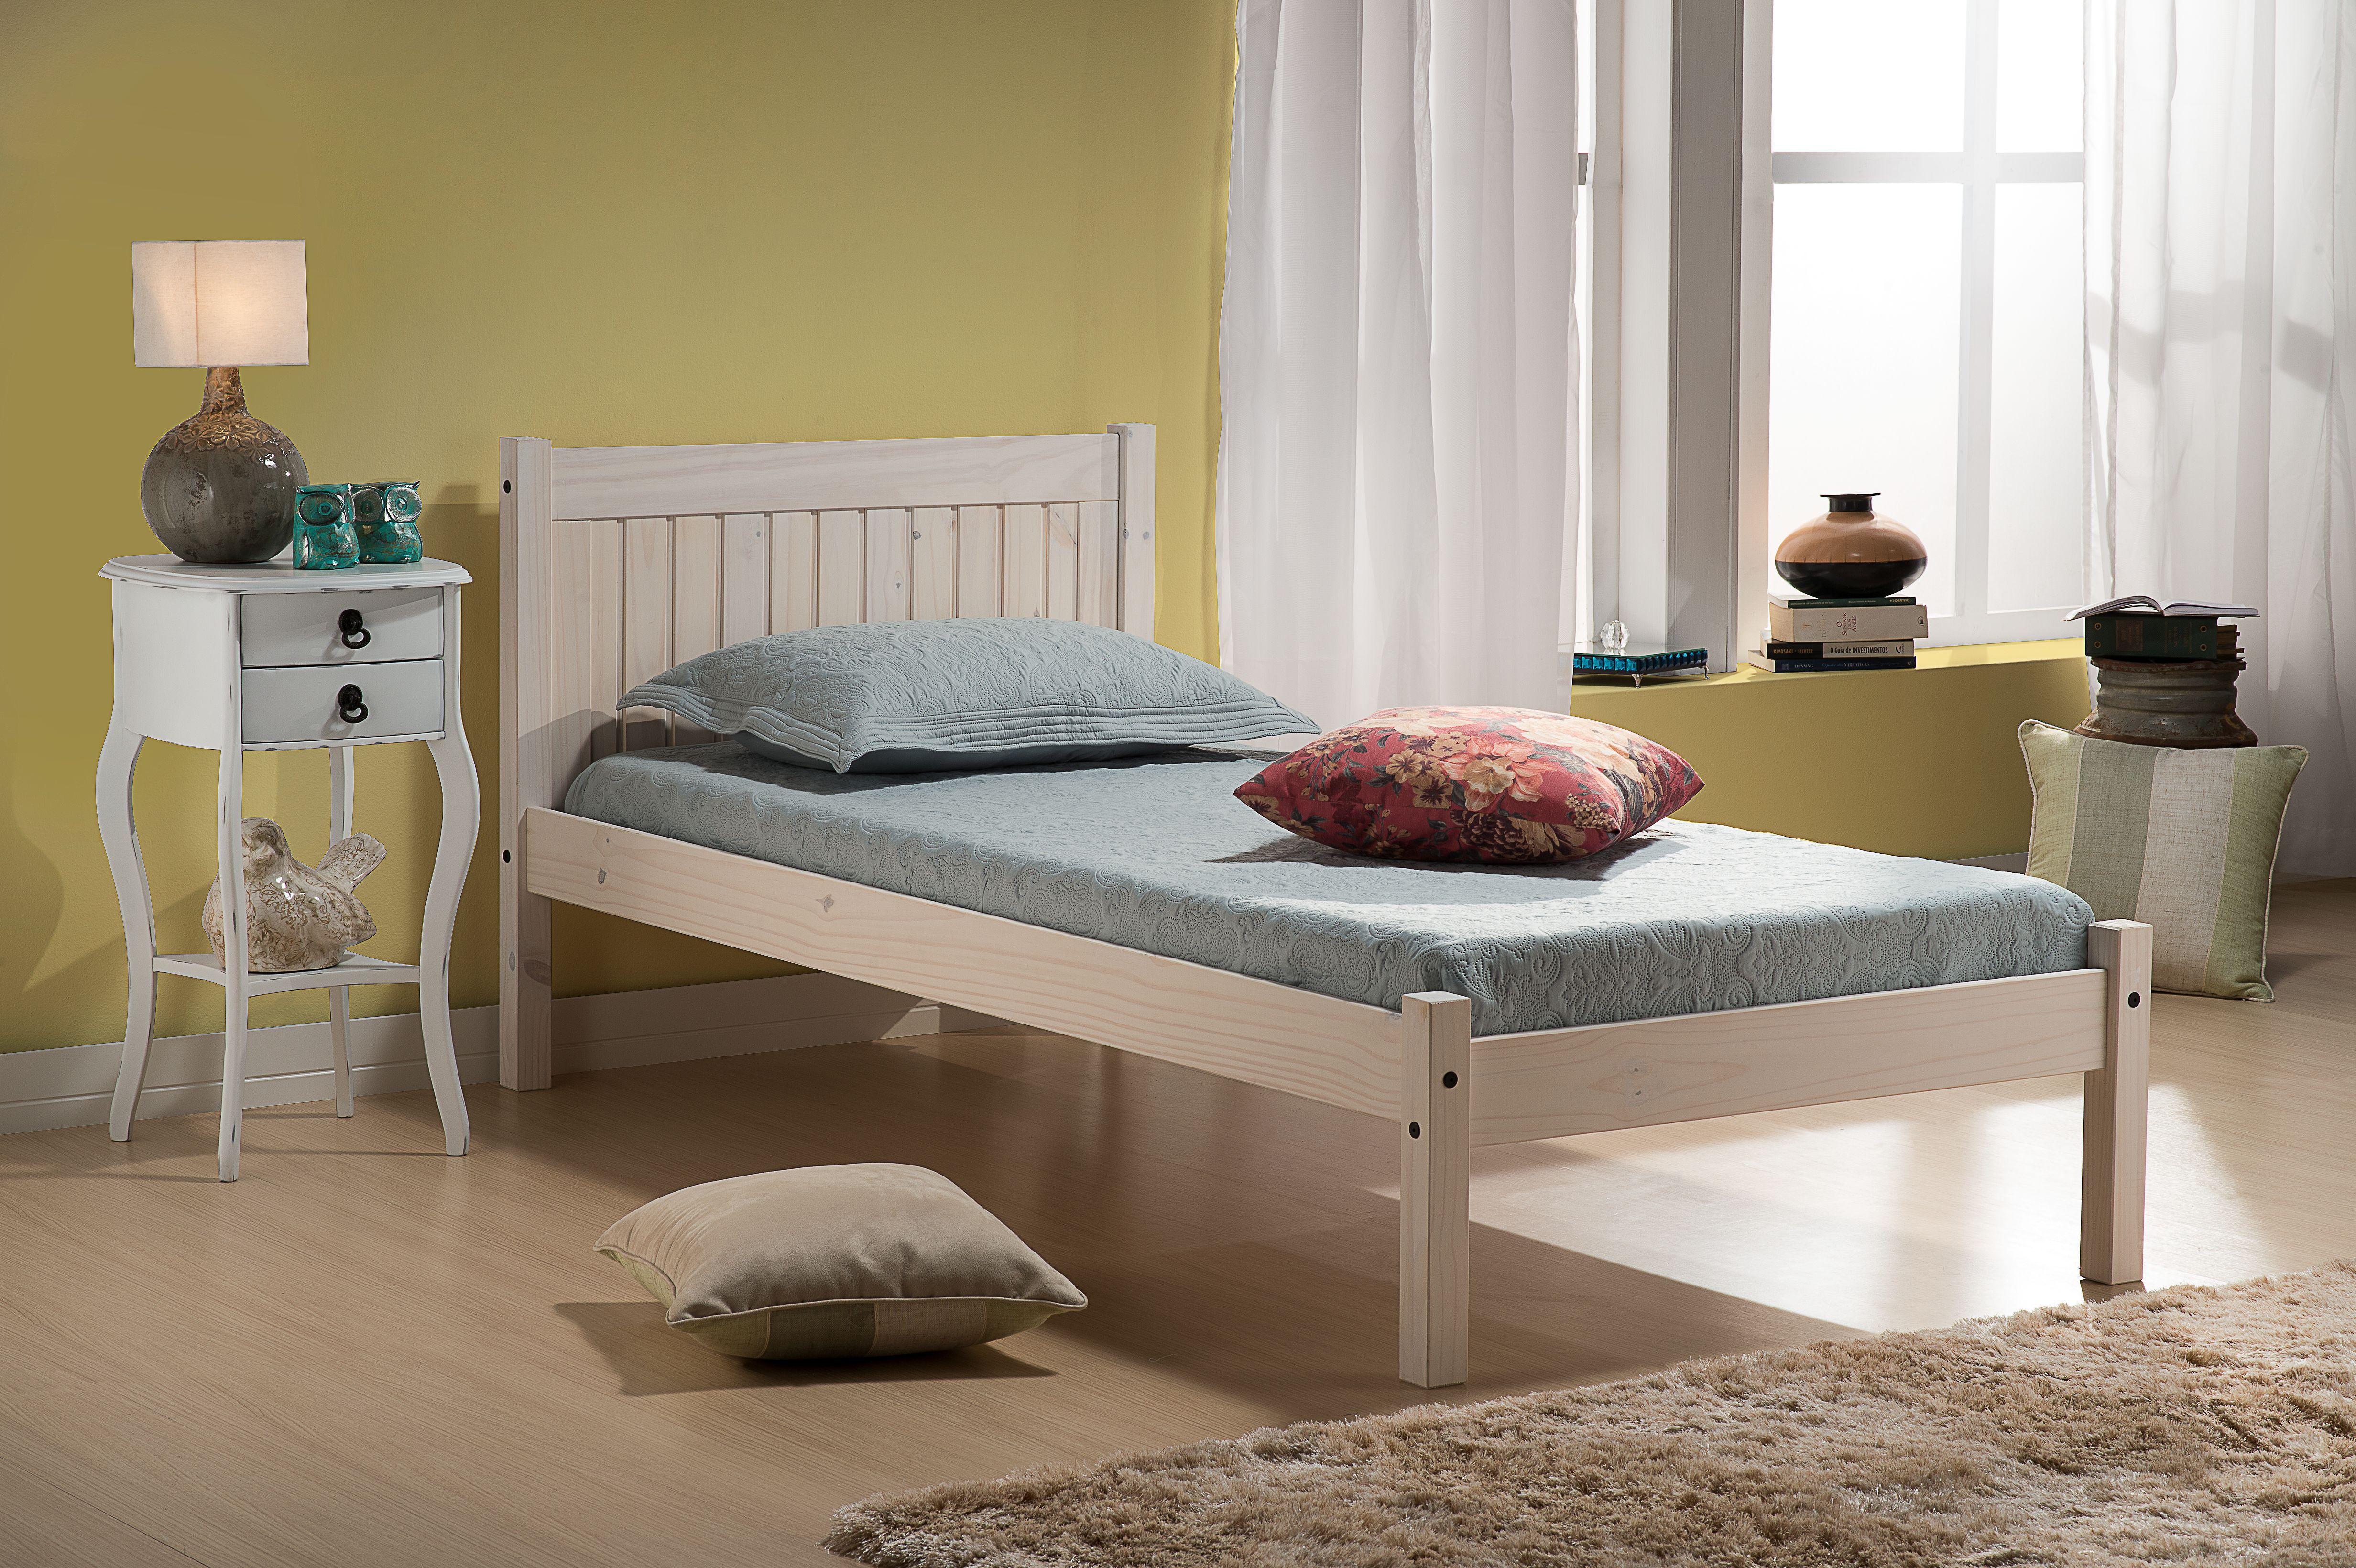 Rio Bed Wooden bed frames, Wooden bed, Bed frame